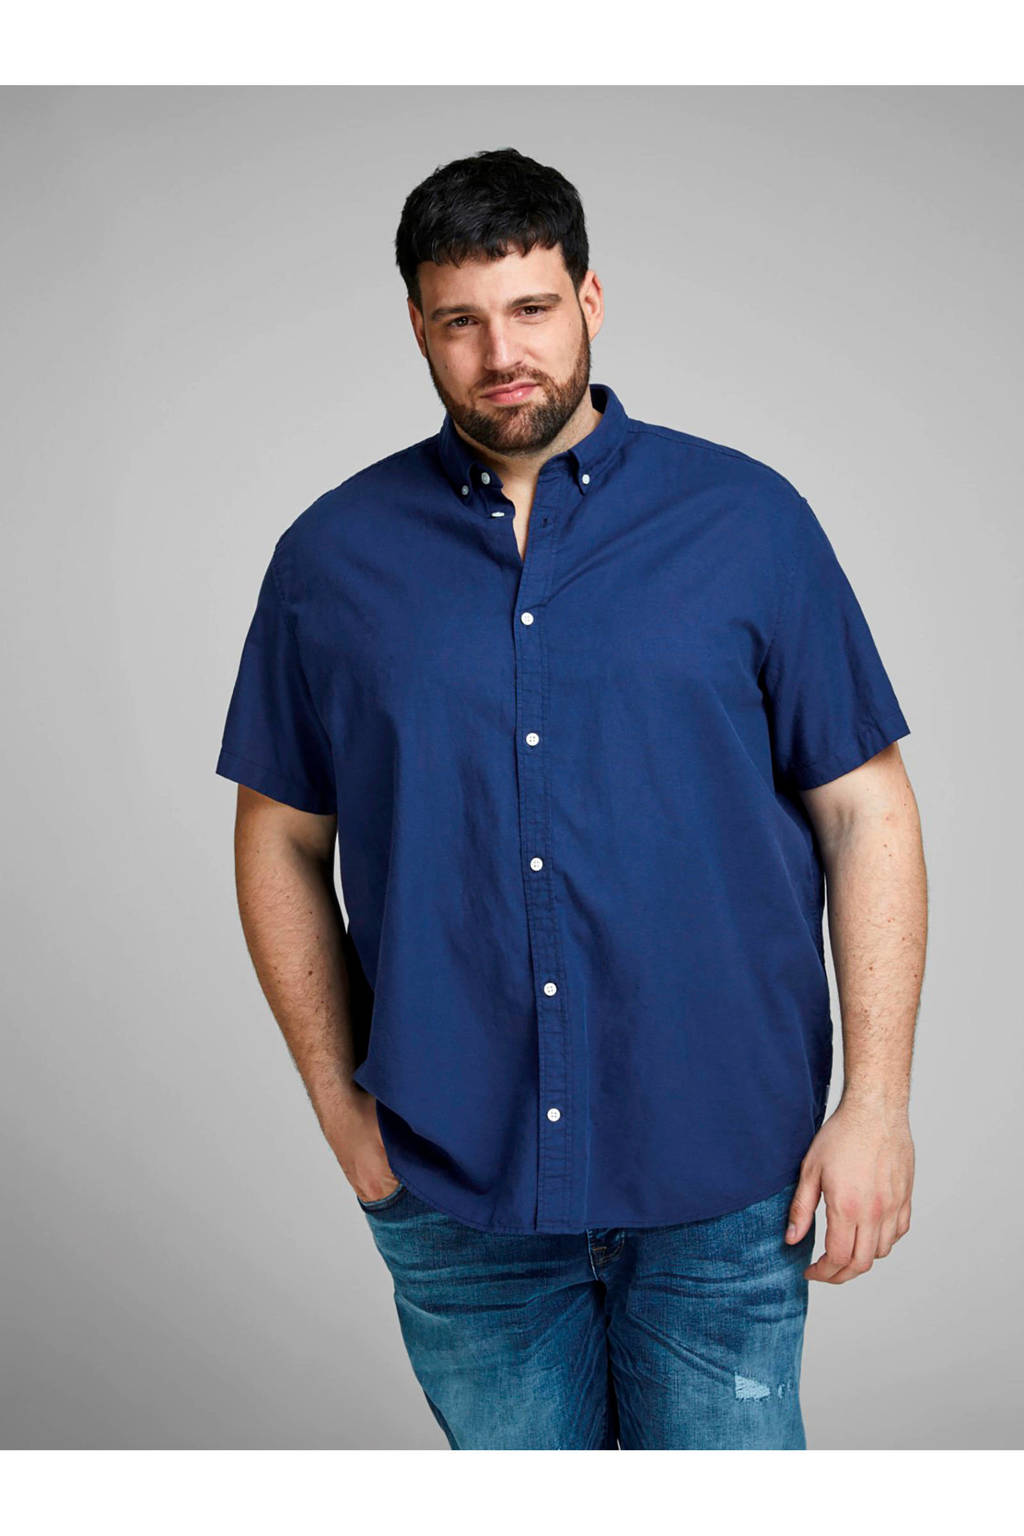 JACK & JONES PLUS SIZE overhemd lichtblauw, Donkerblauw